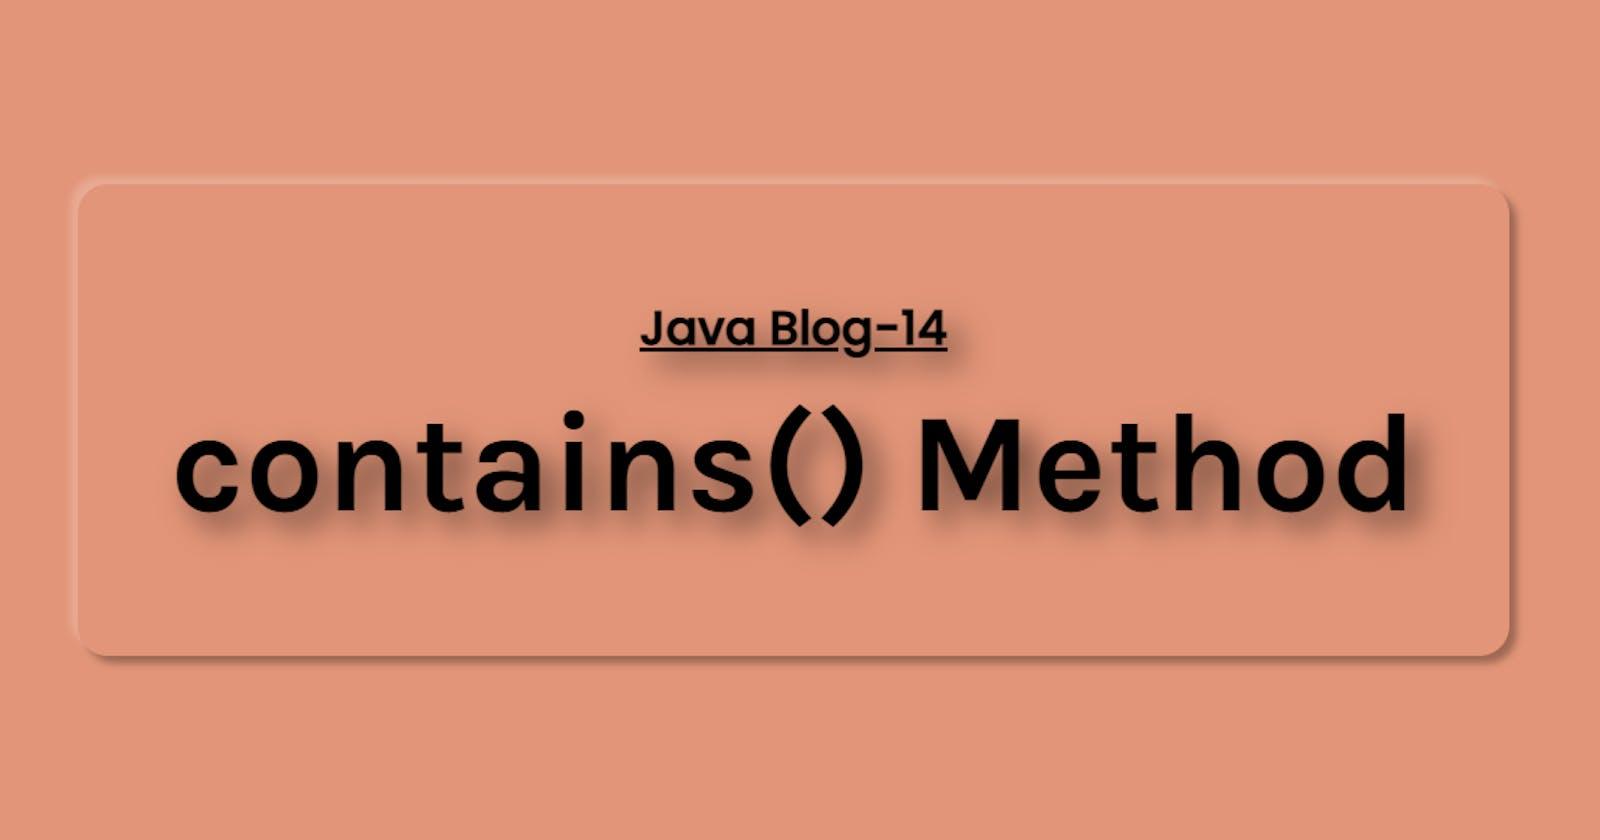 Java contains() method